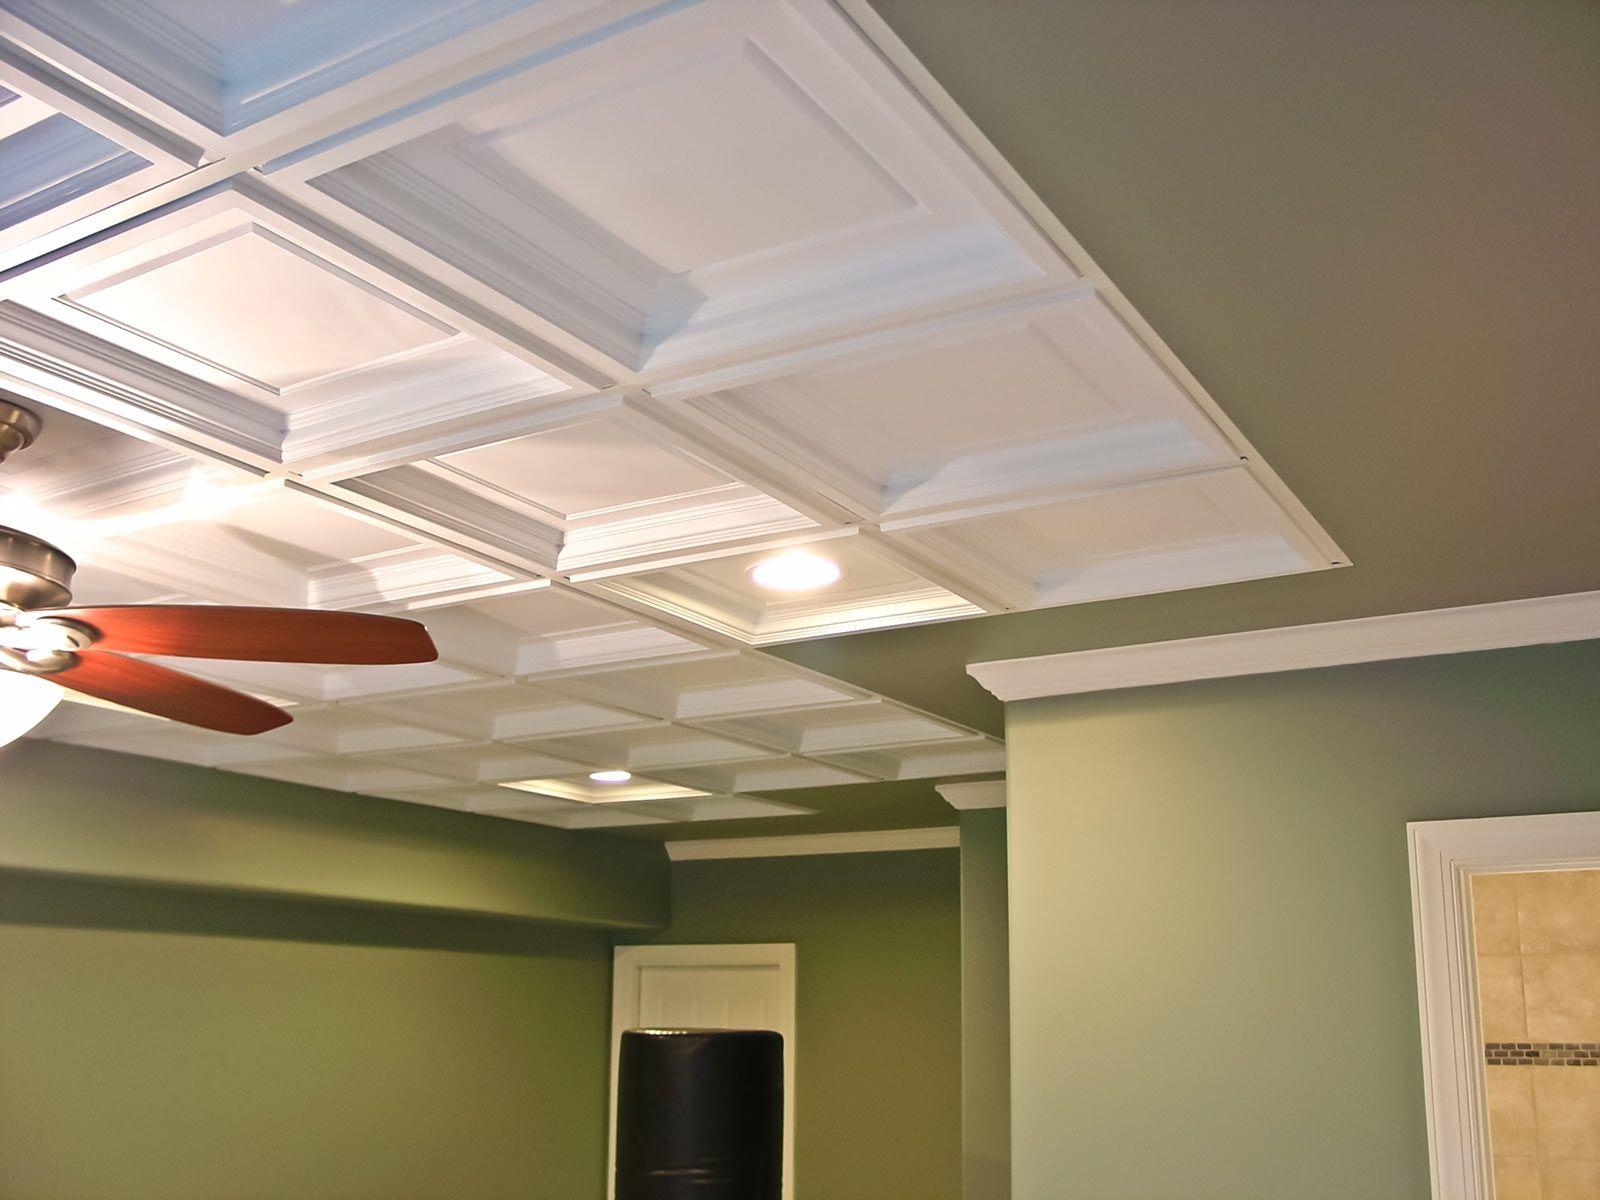 Decorative Drop Ceiling Tiles 24 Http Creativechairsandtables